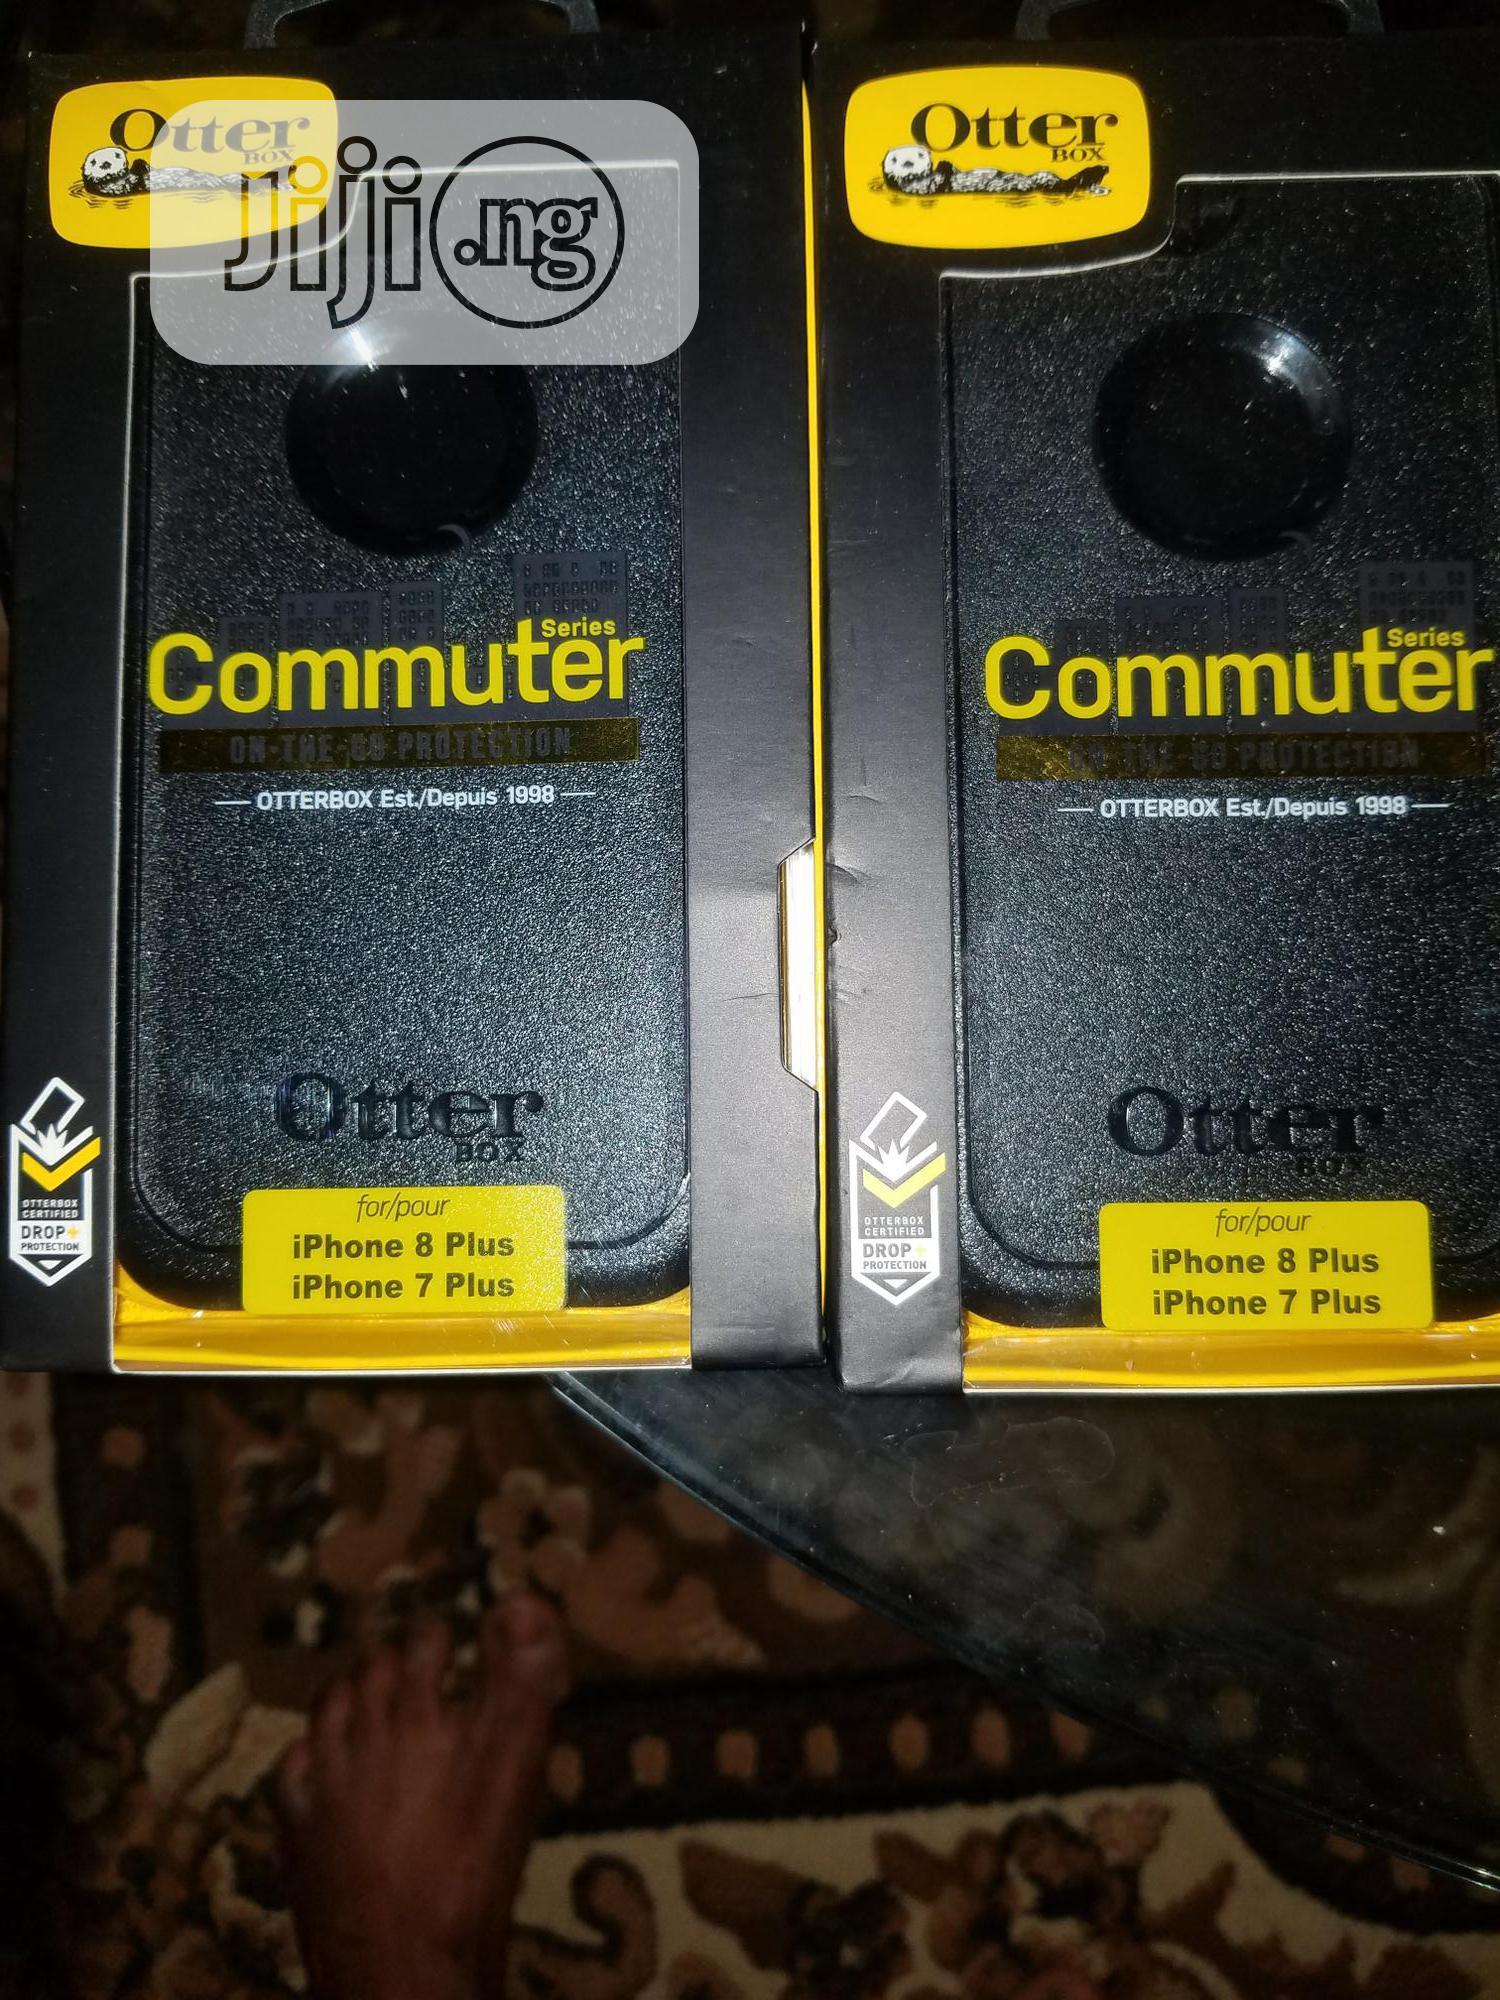 Archive: iPhone8 Plus Otterbox Commuter Case